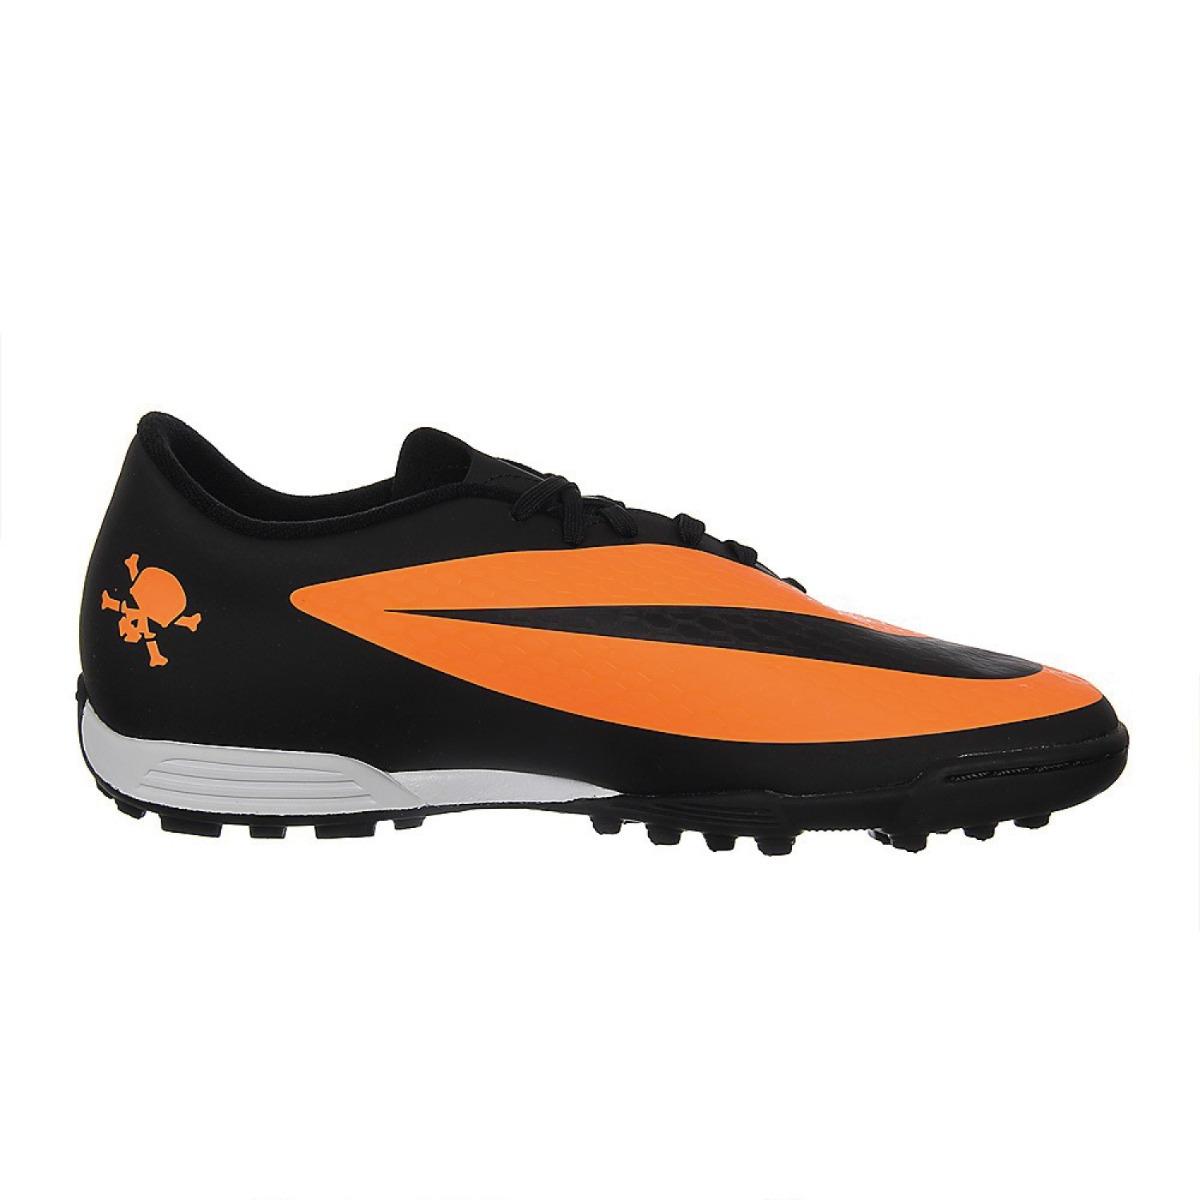 Tenis Nike Hypervenom Phade Original Hombre 599844 008 -   760.00 en ... 016fe81080f64